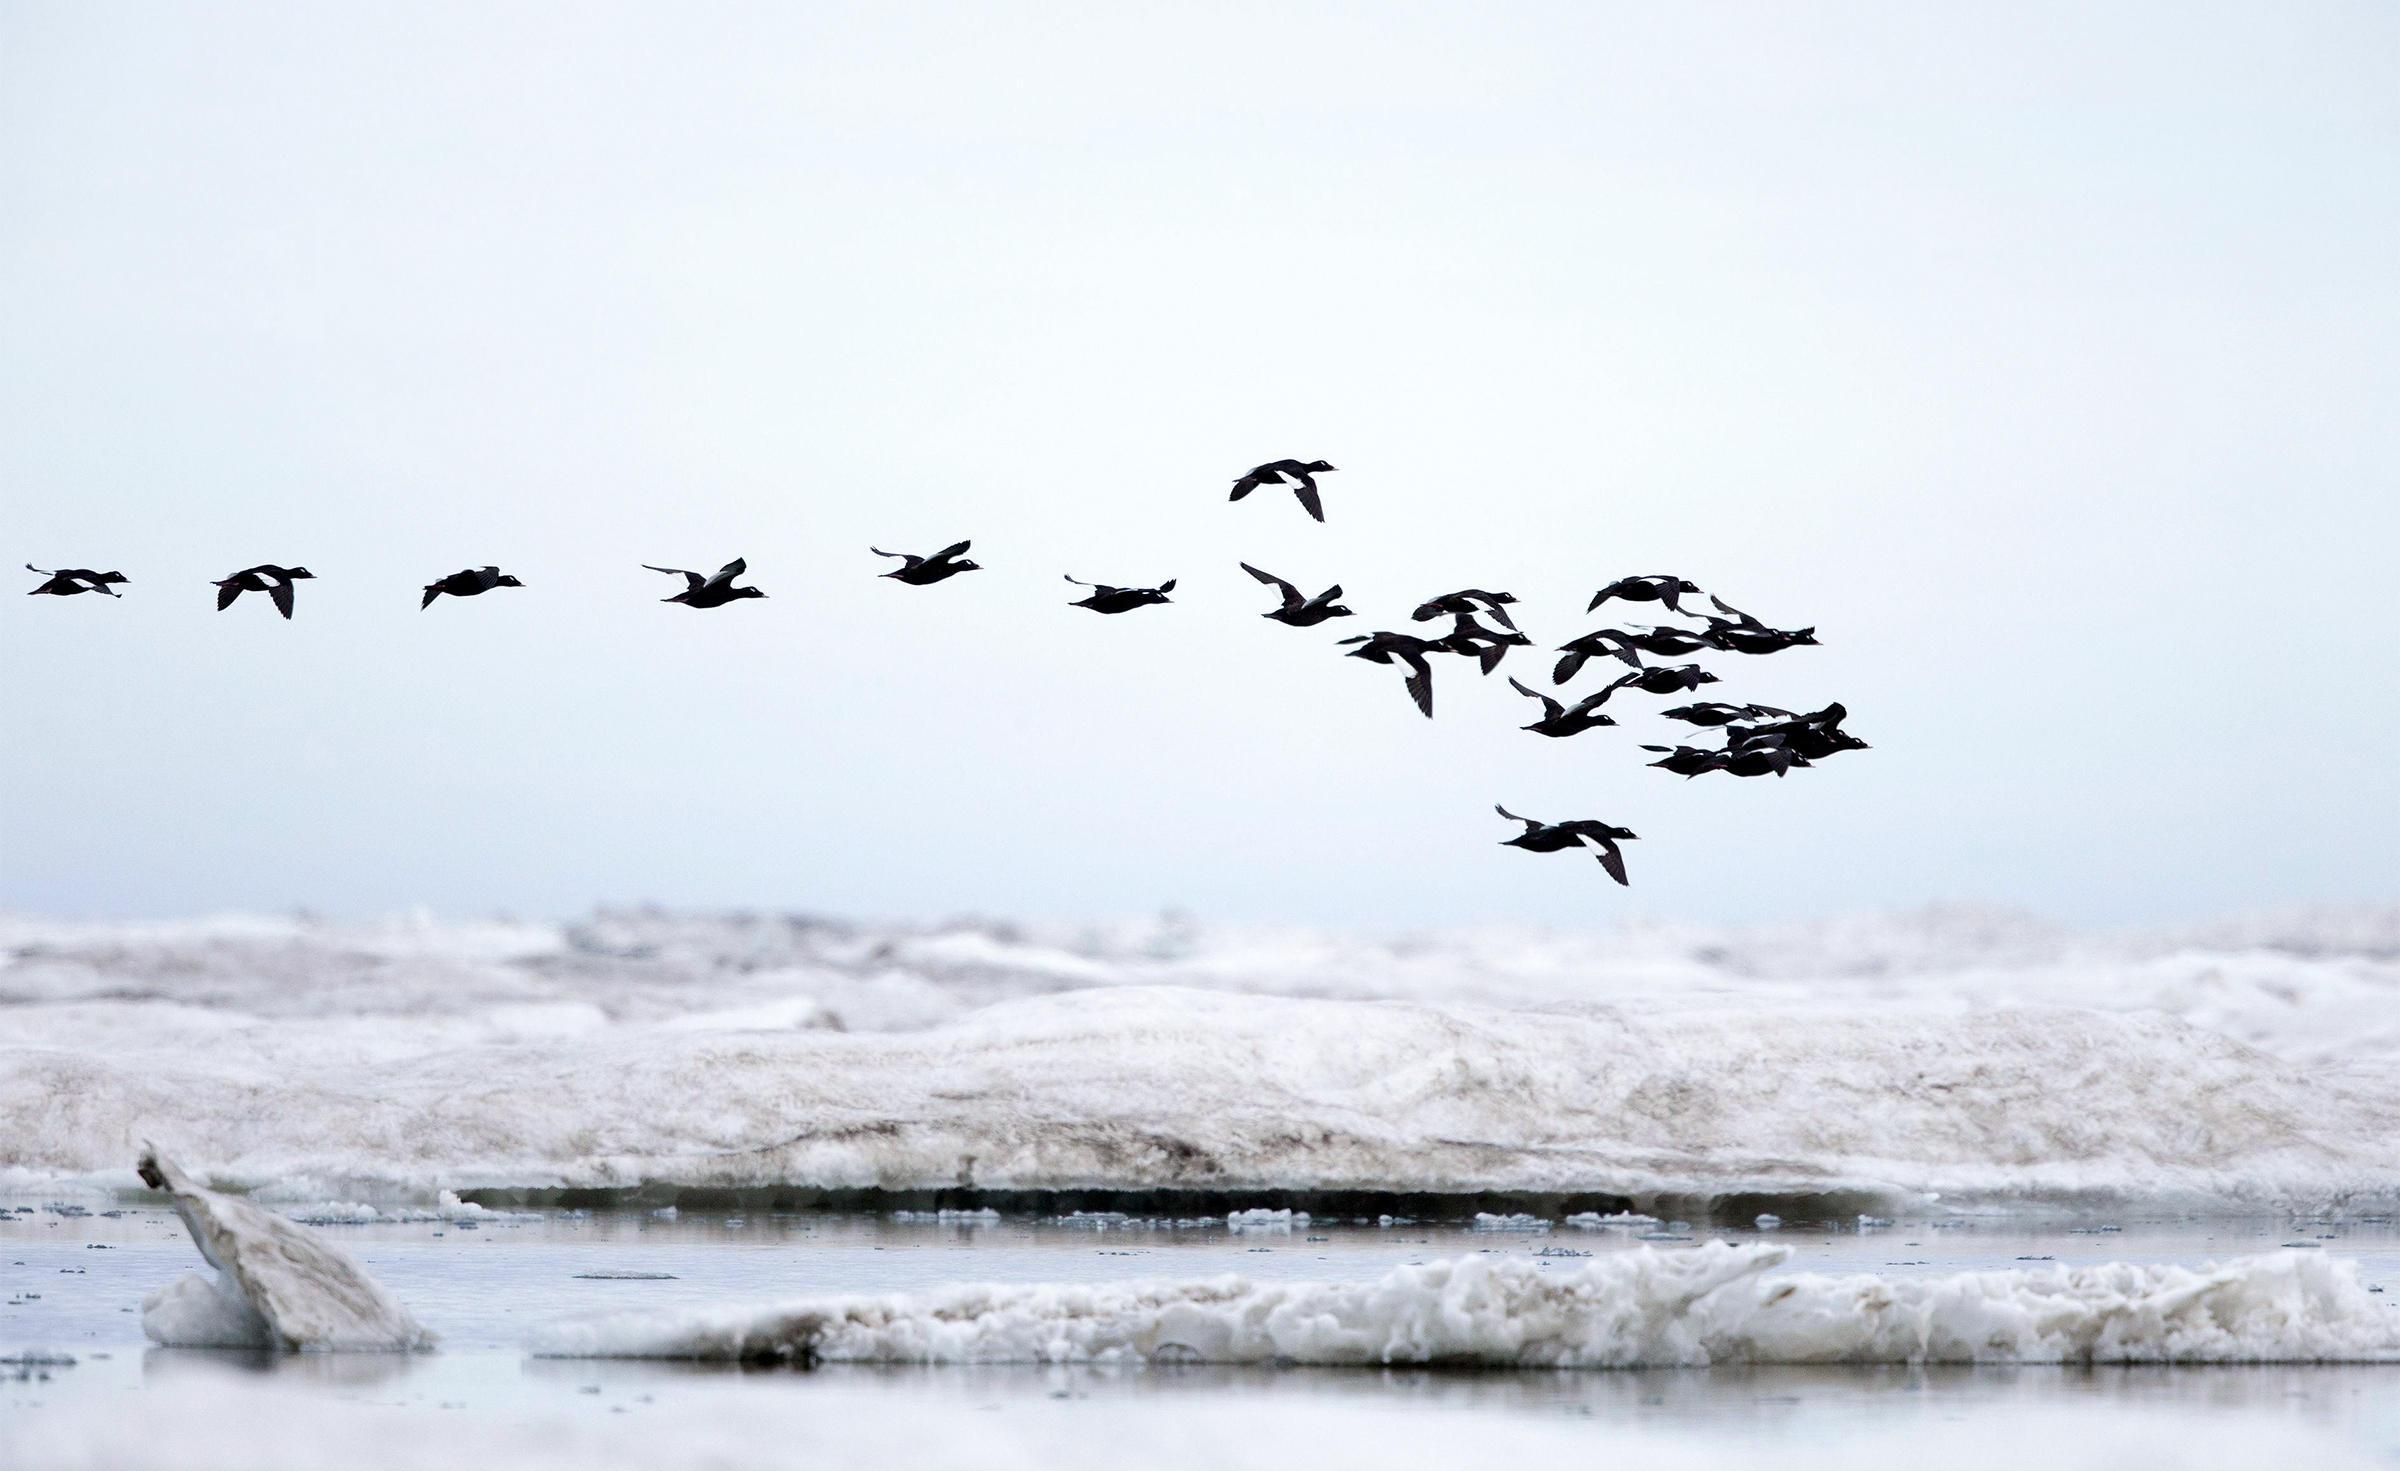 White-winged Scoters. Hemis/Alamy